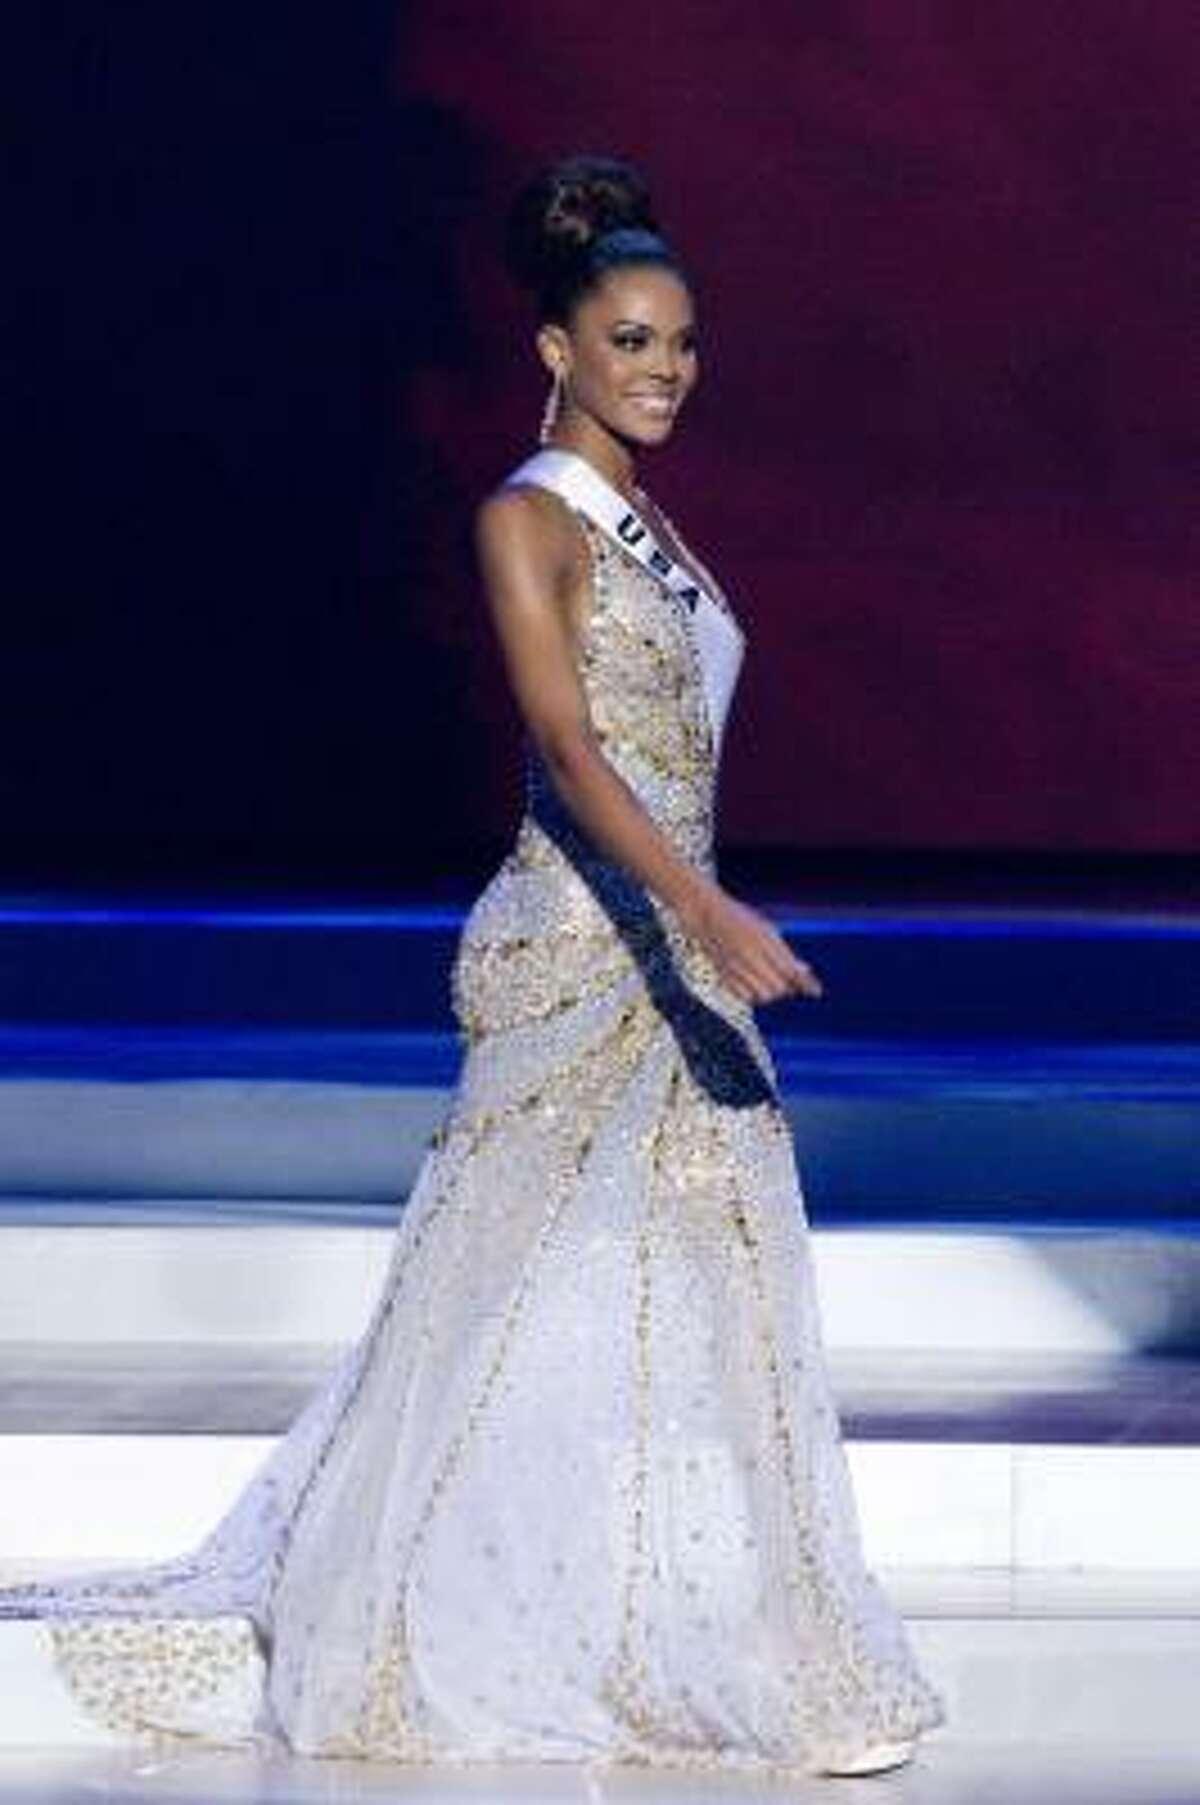 Miss USA 2008 Crystle Stewart Missouri City, Texas